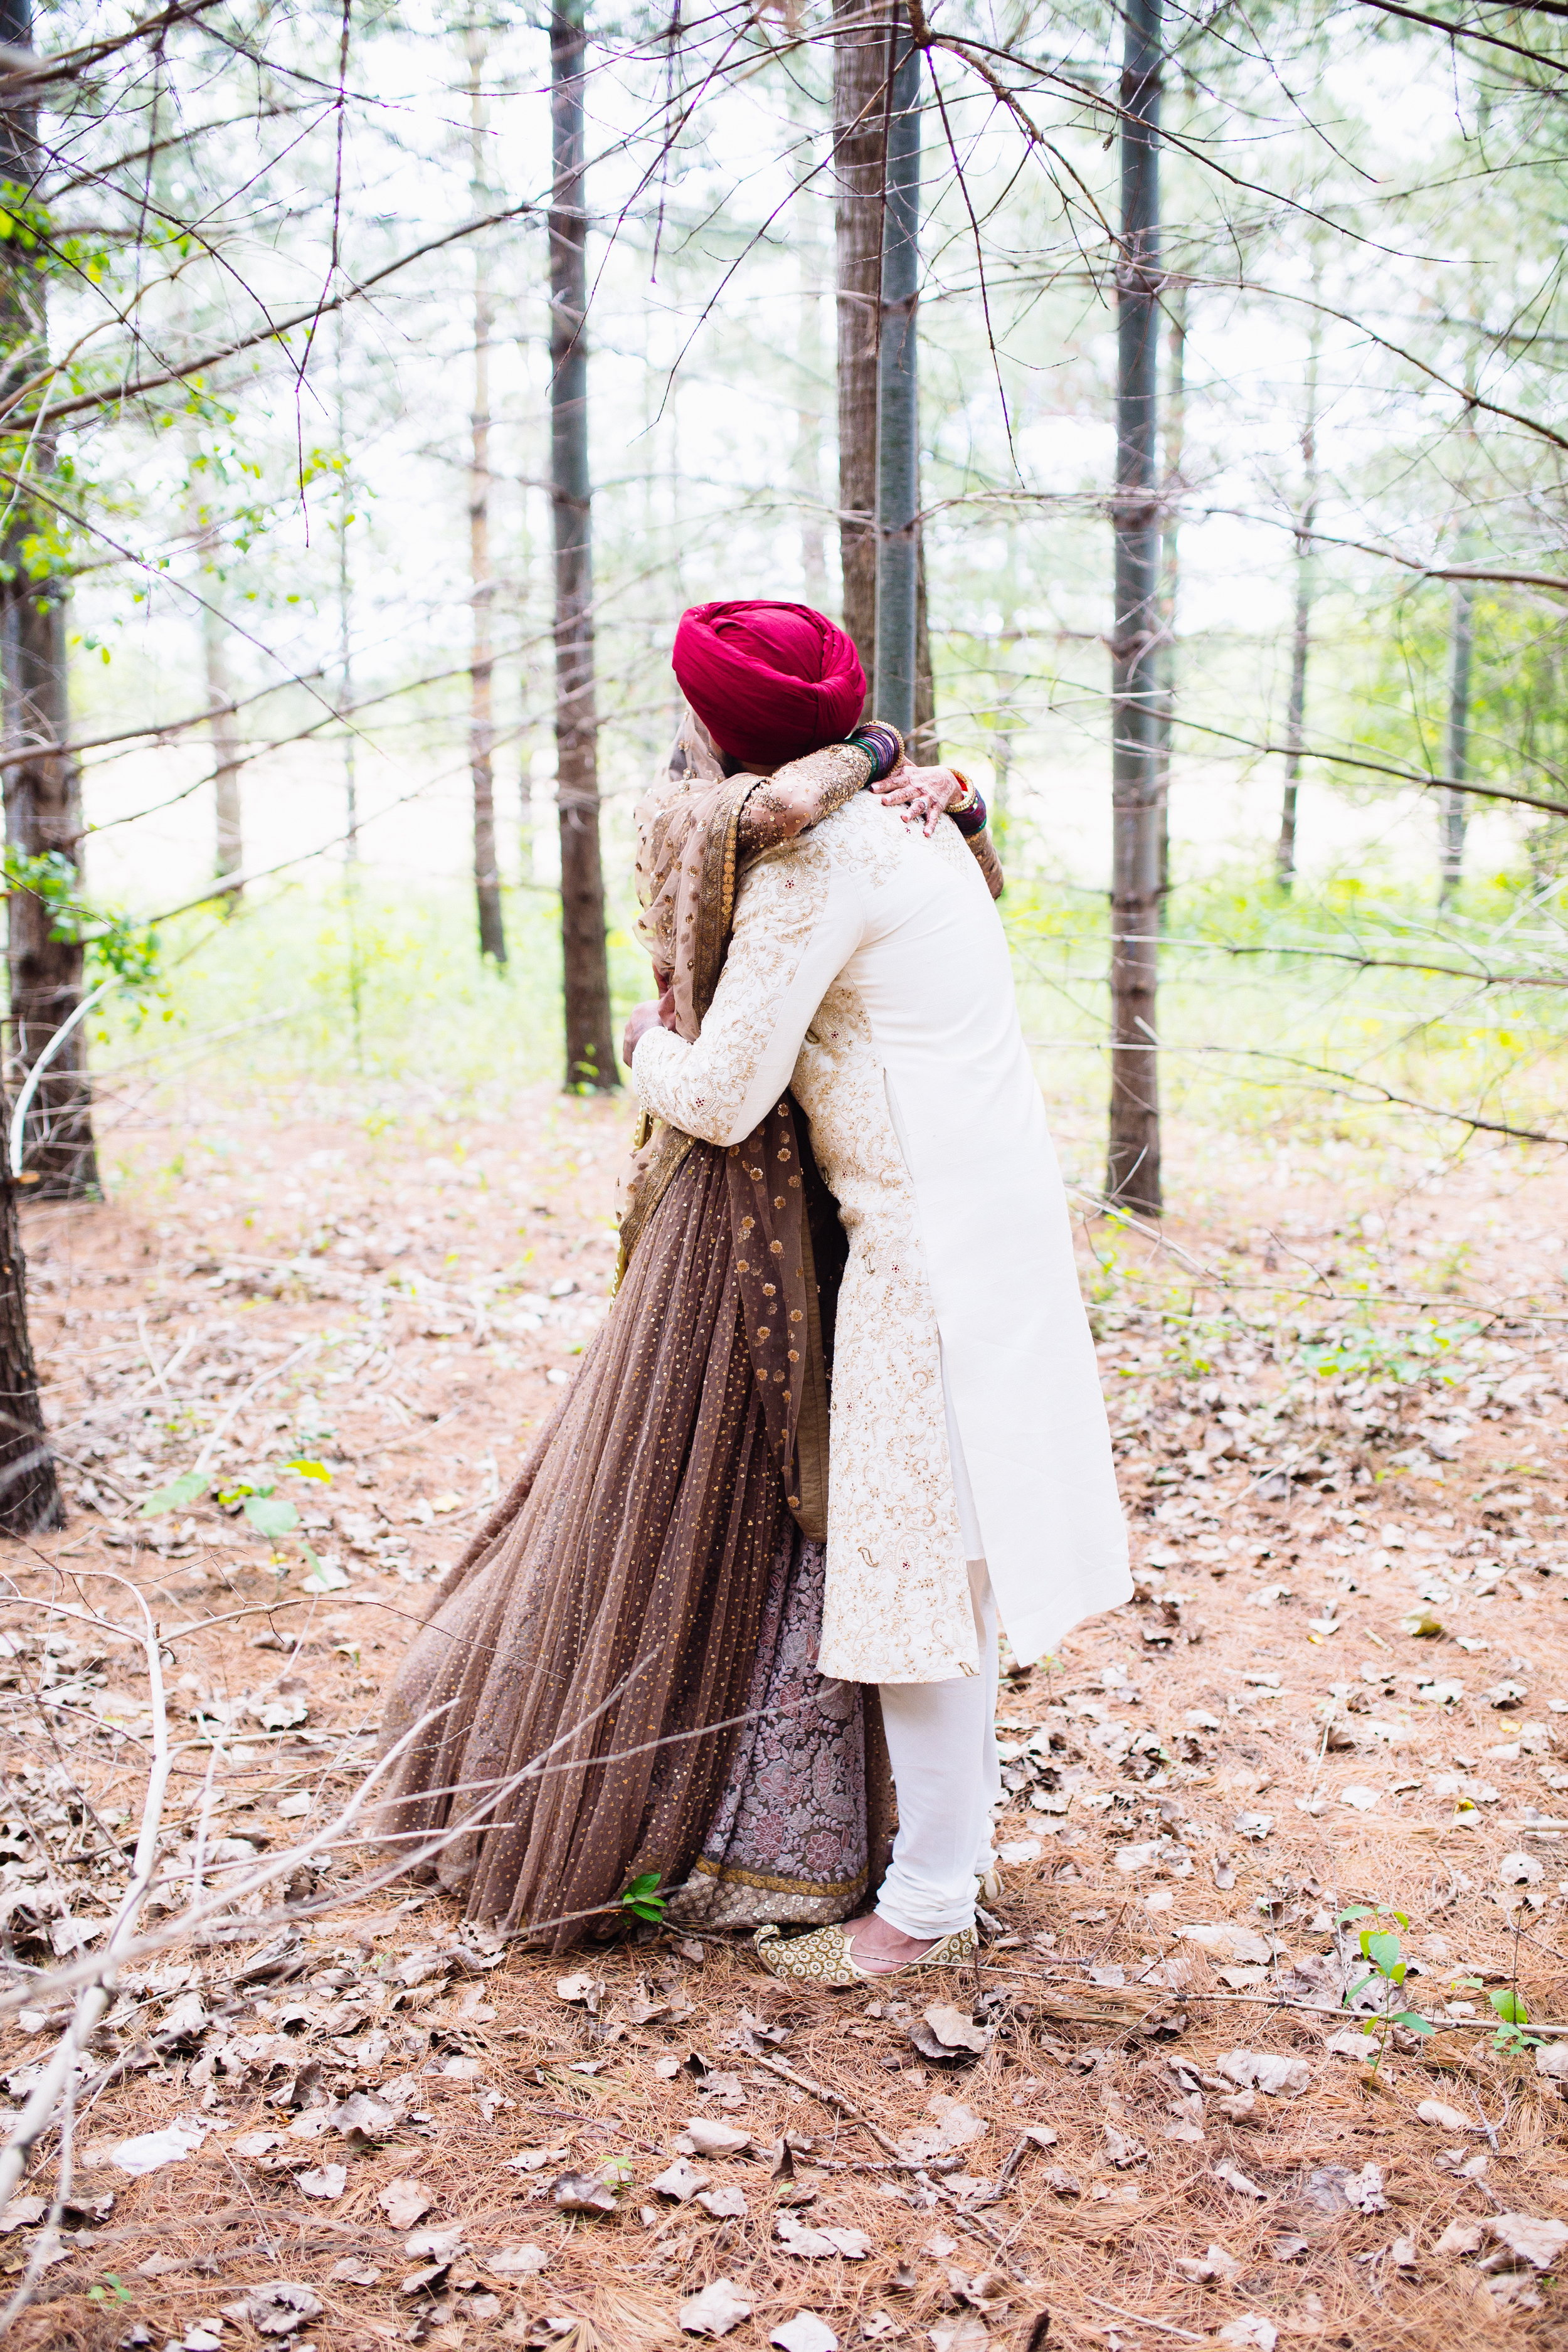 Fin Gurpreet & Sabir Wedding (3409 of 5292).jpg